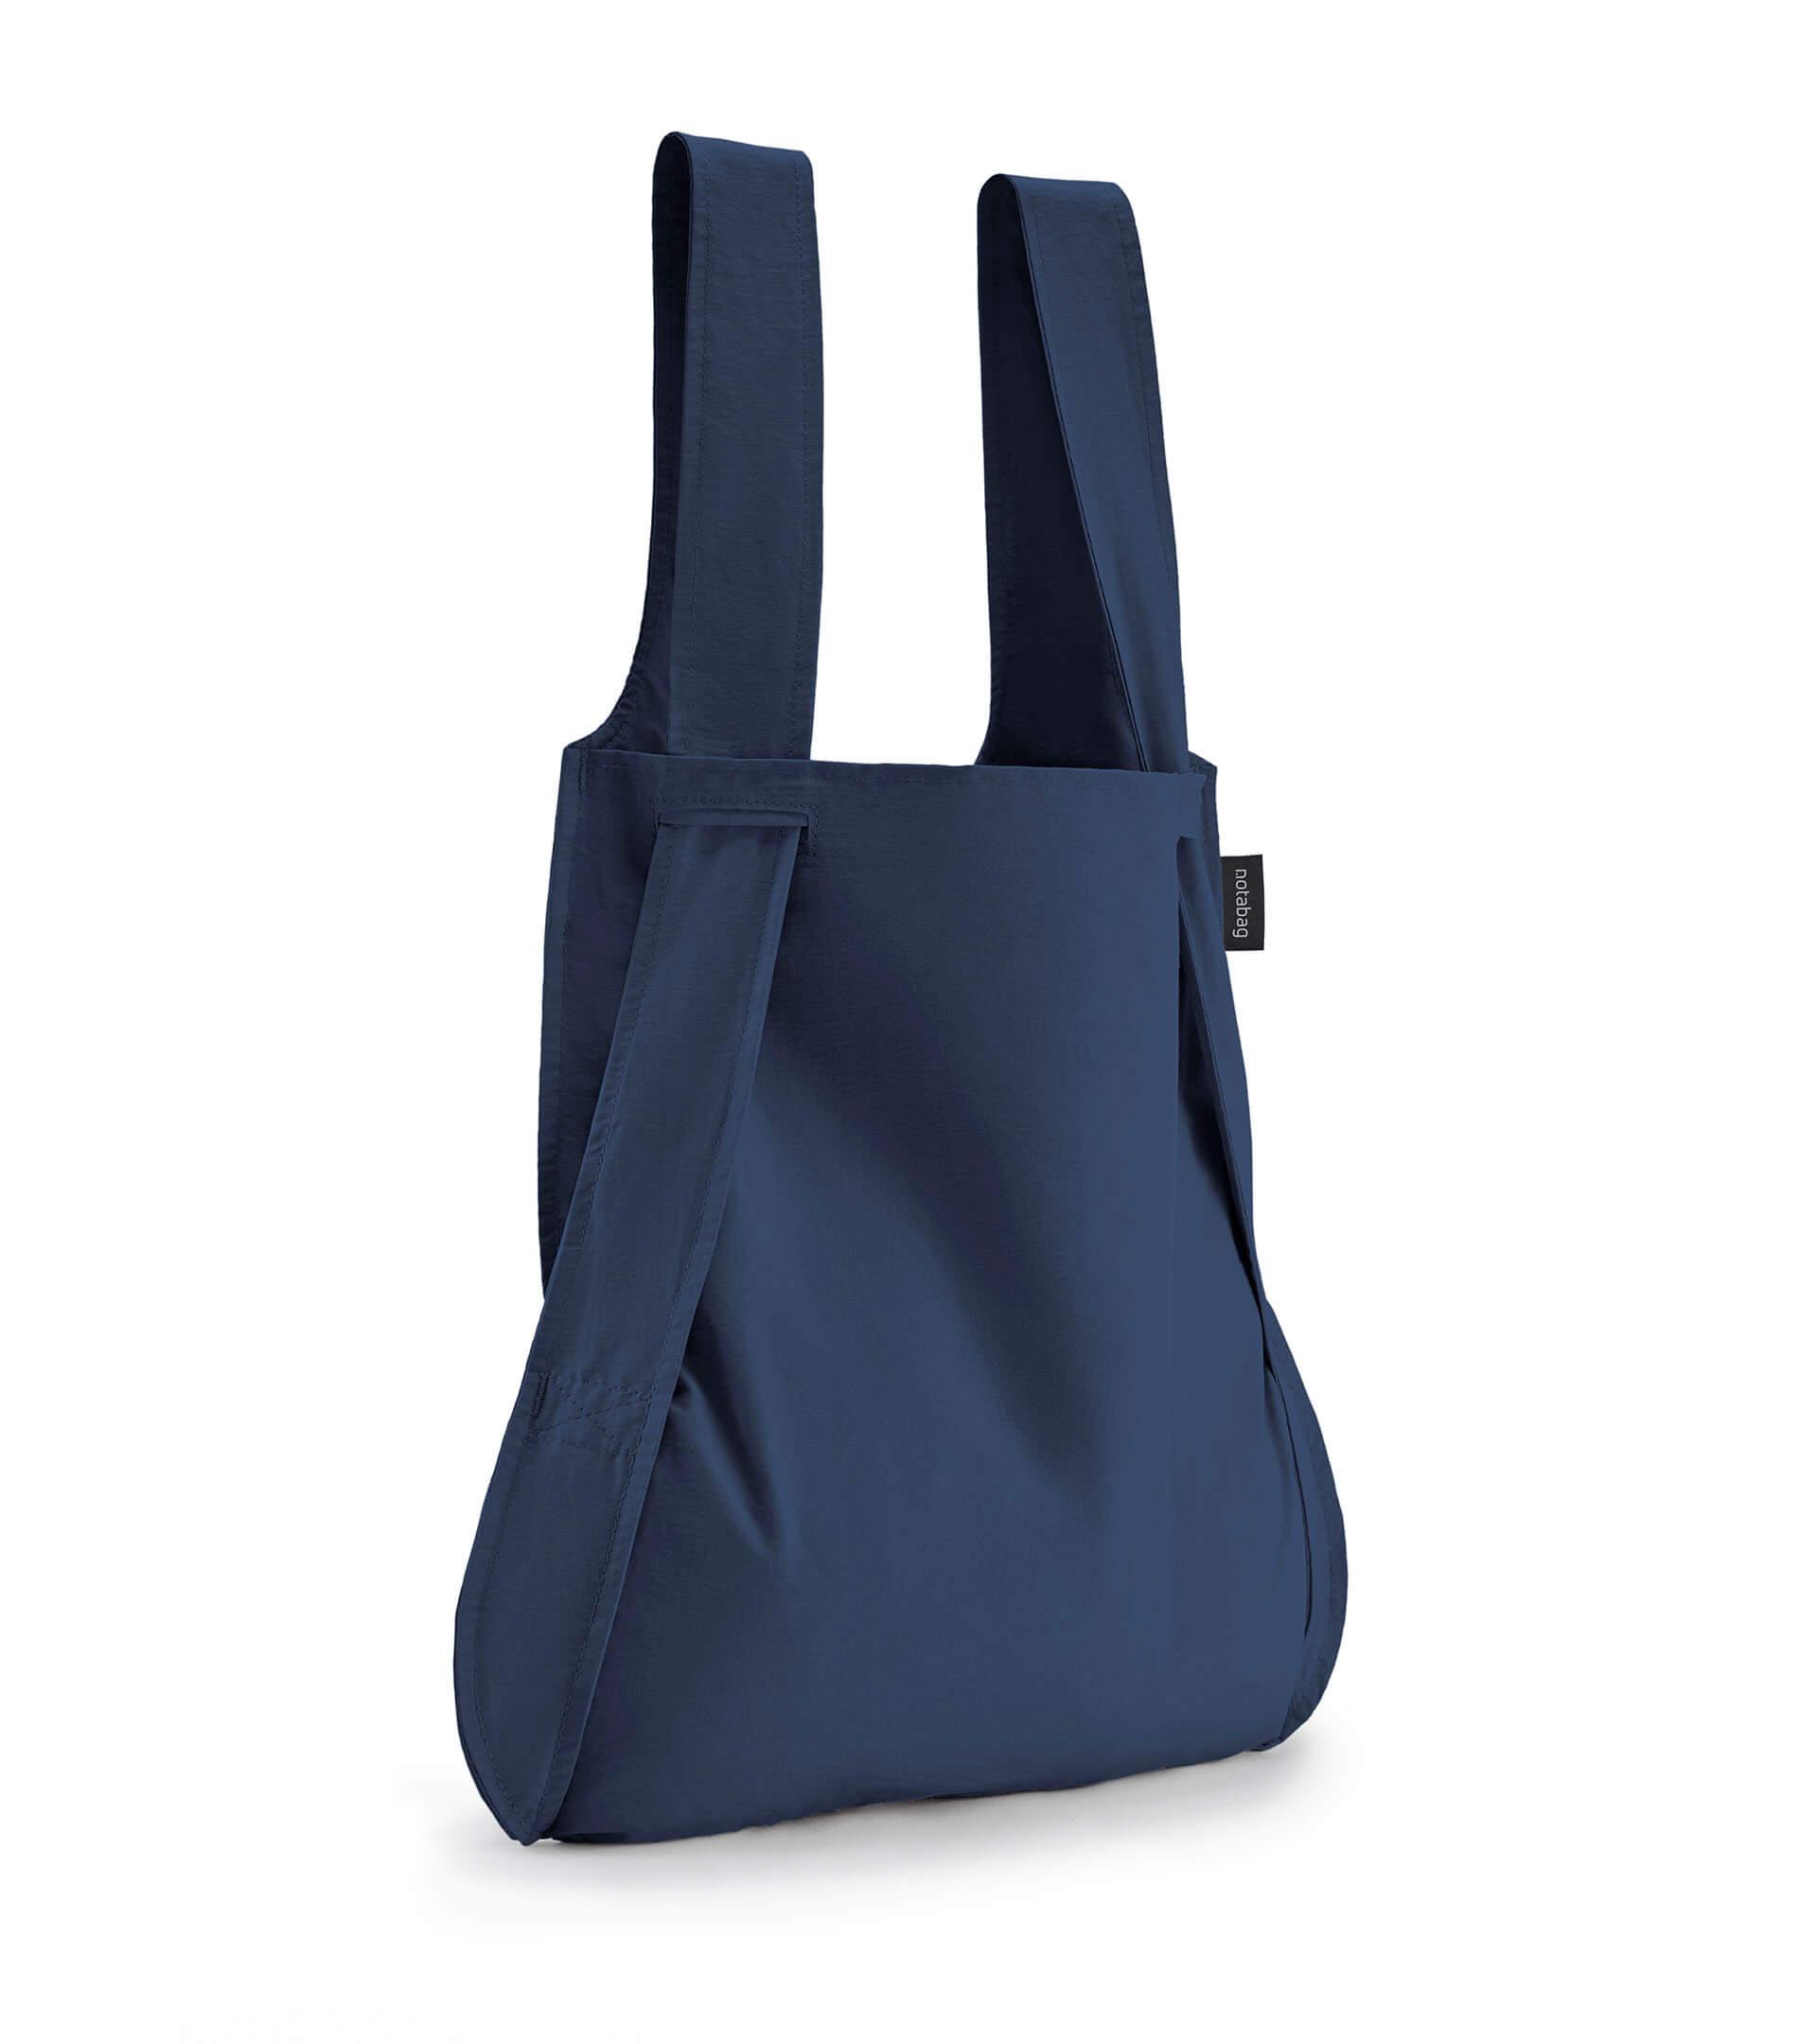 Notabag Rugzak / Shopper Navy Blauw